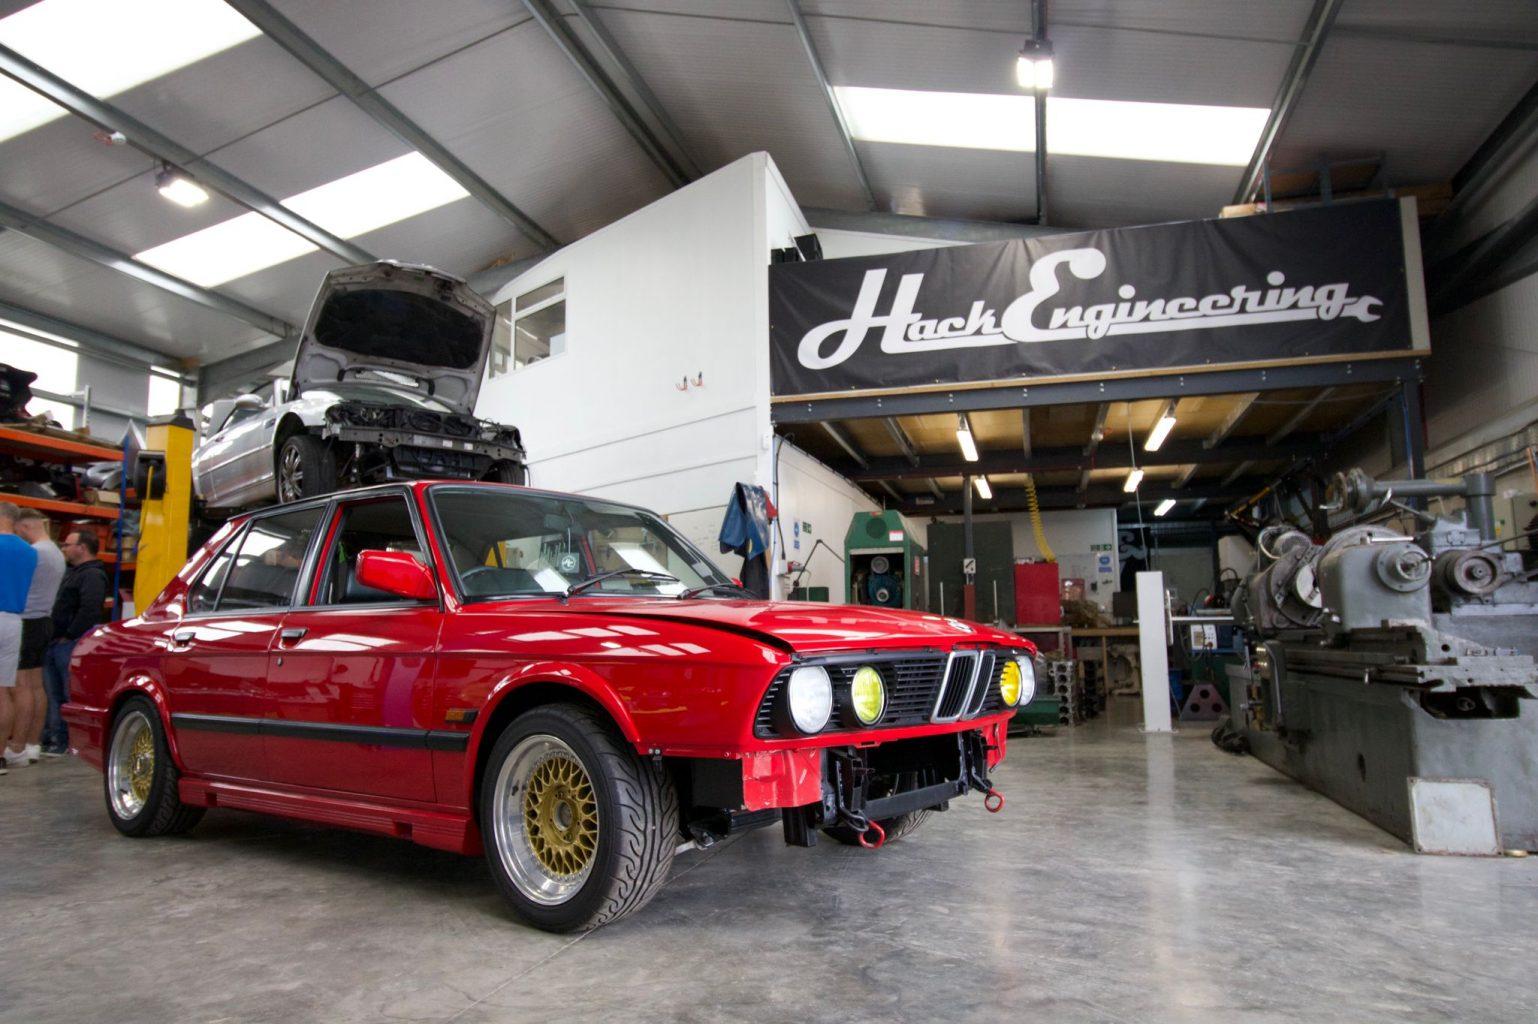 BMW Car Club GB Visit Hack Engineering